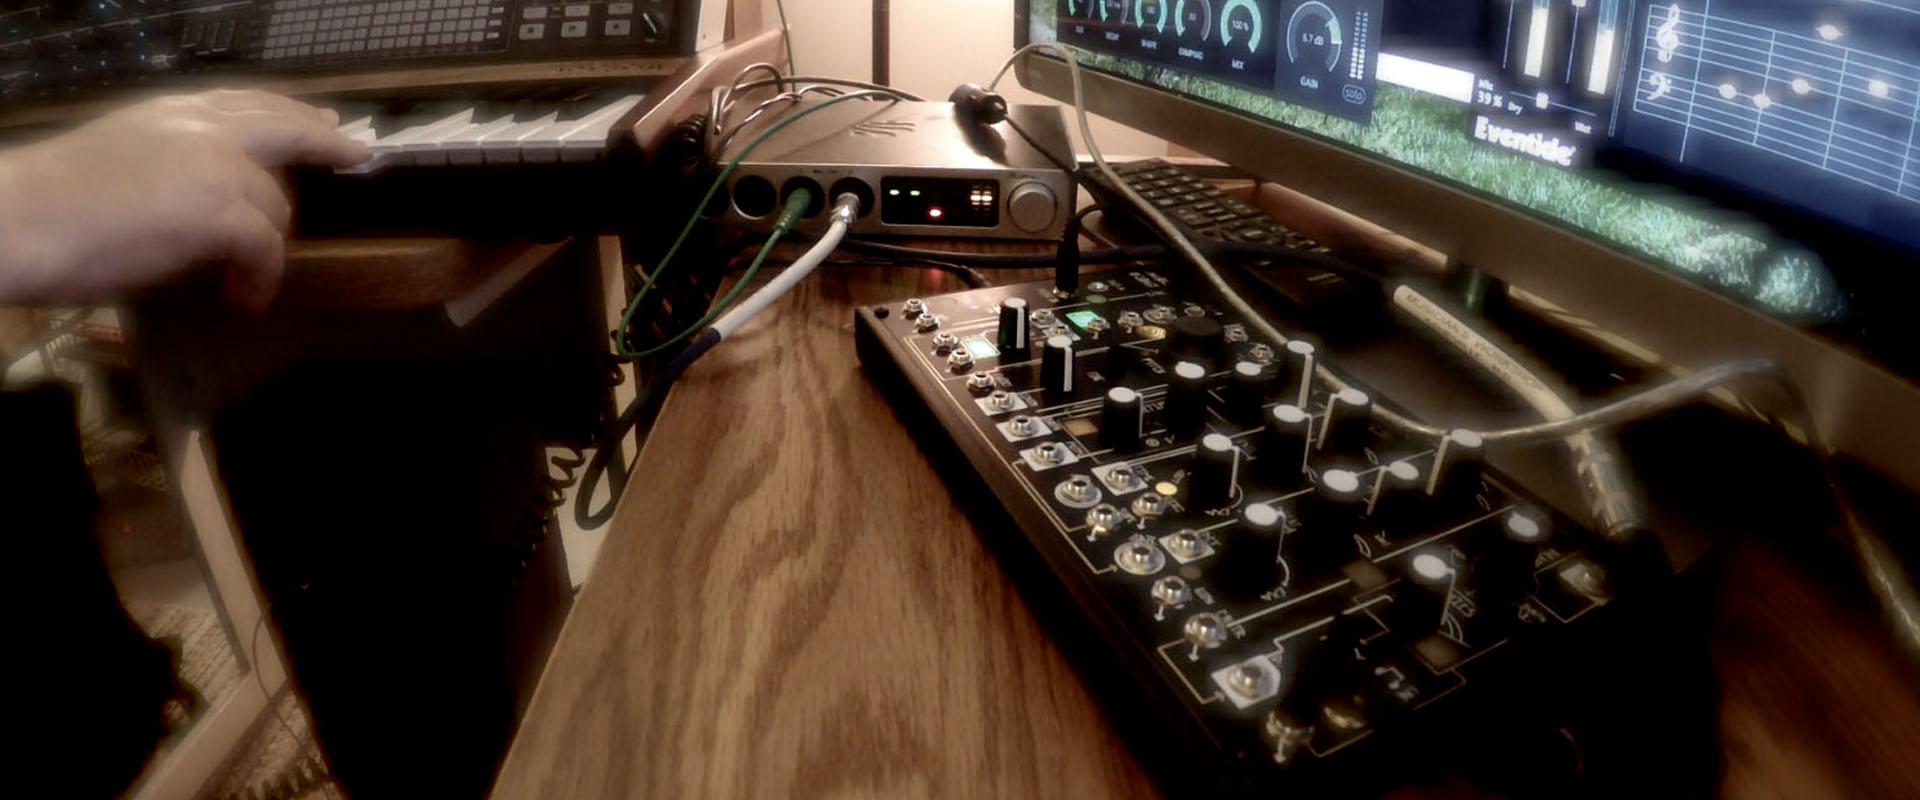 Make Noise - ExperimentalSynth